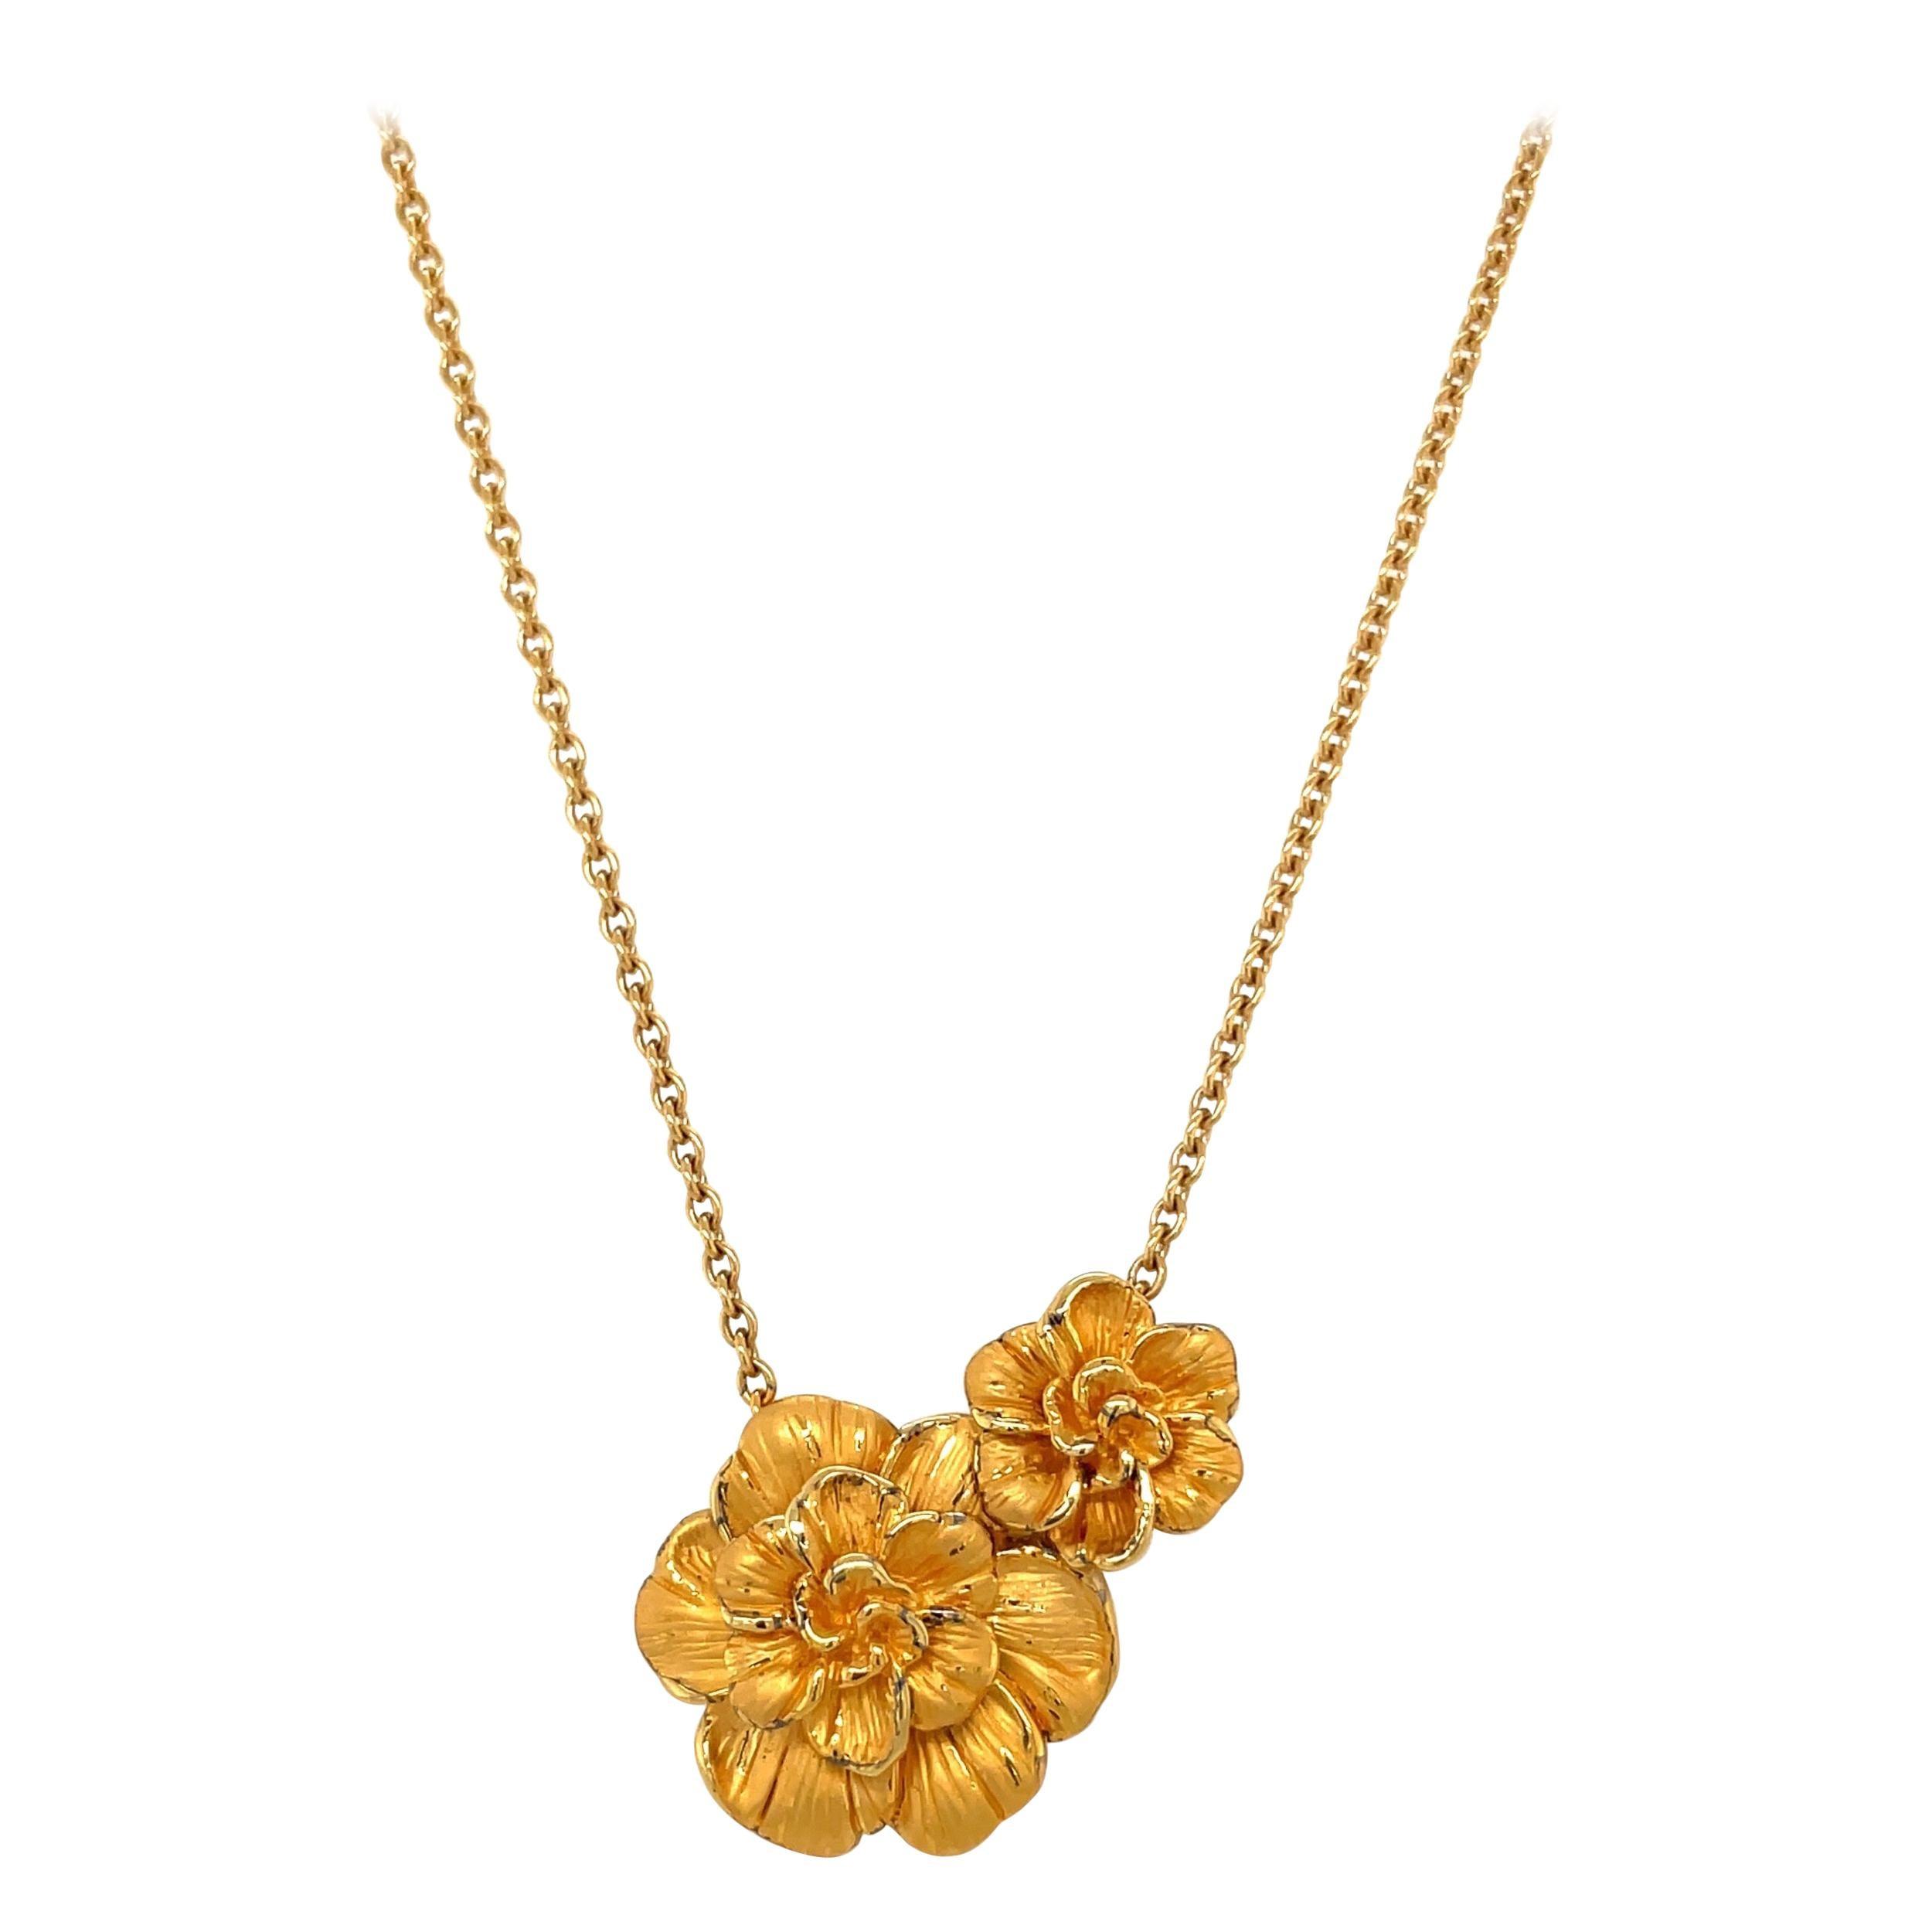 Carrera y Carrera 18kt Yellow Gold Gardenia Flower Necklace